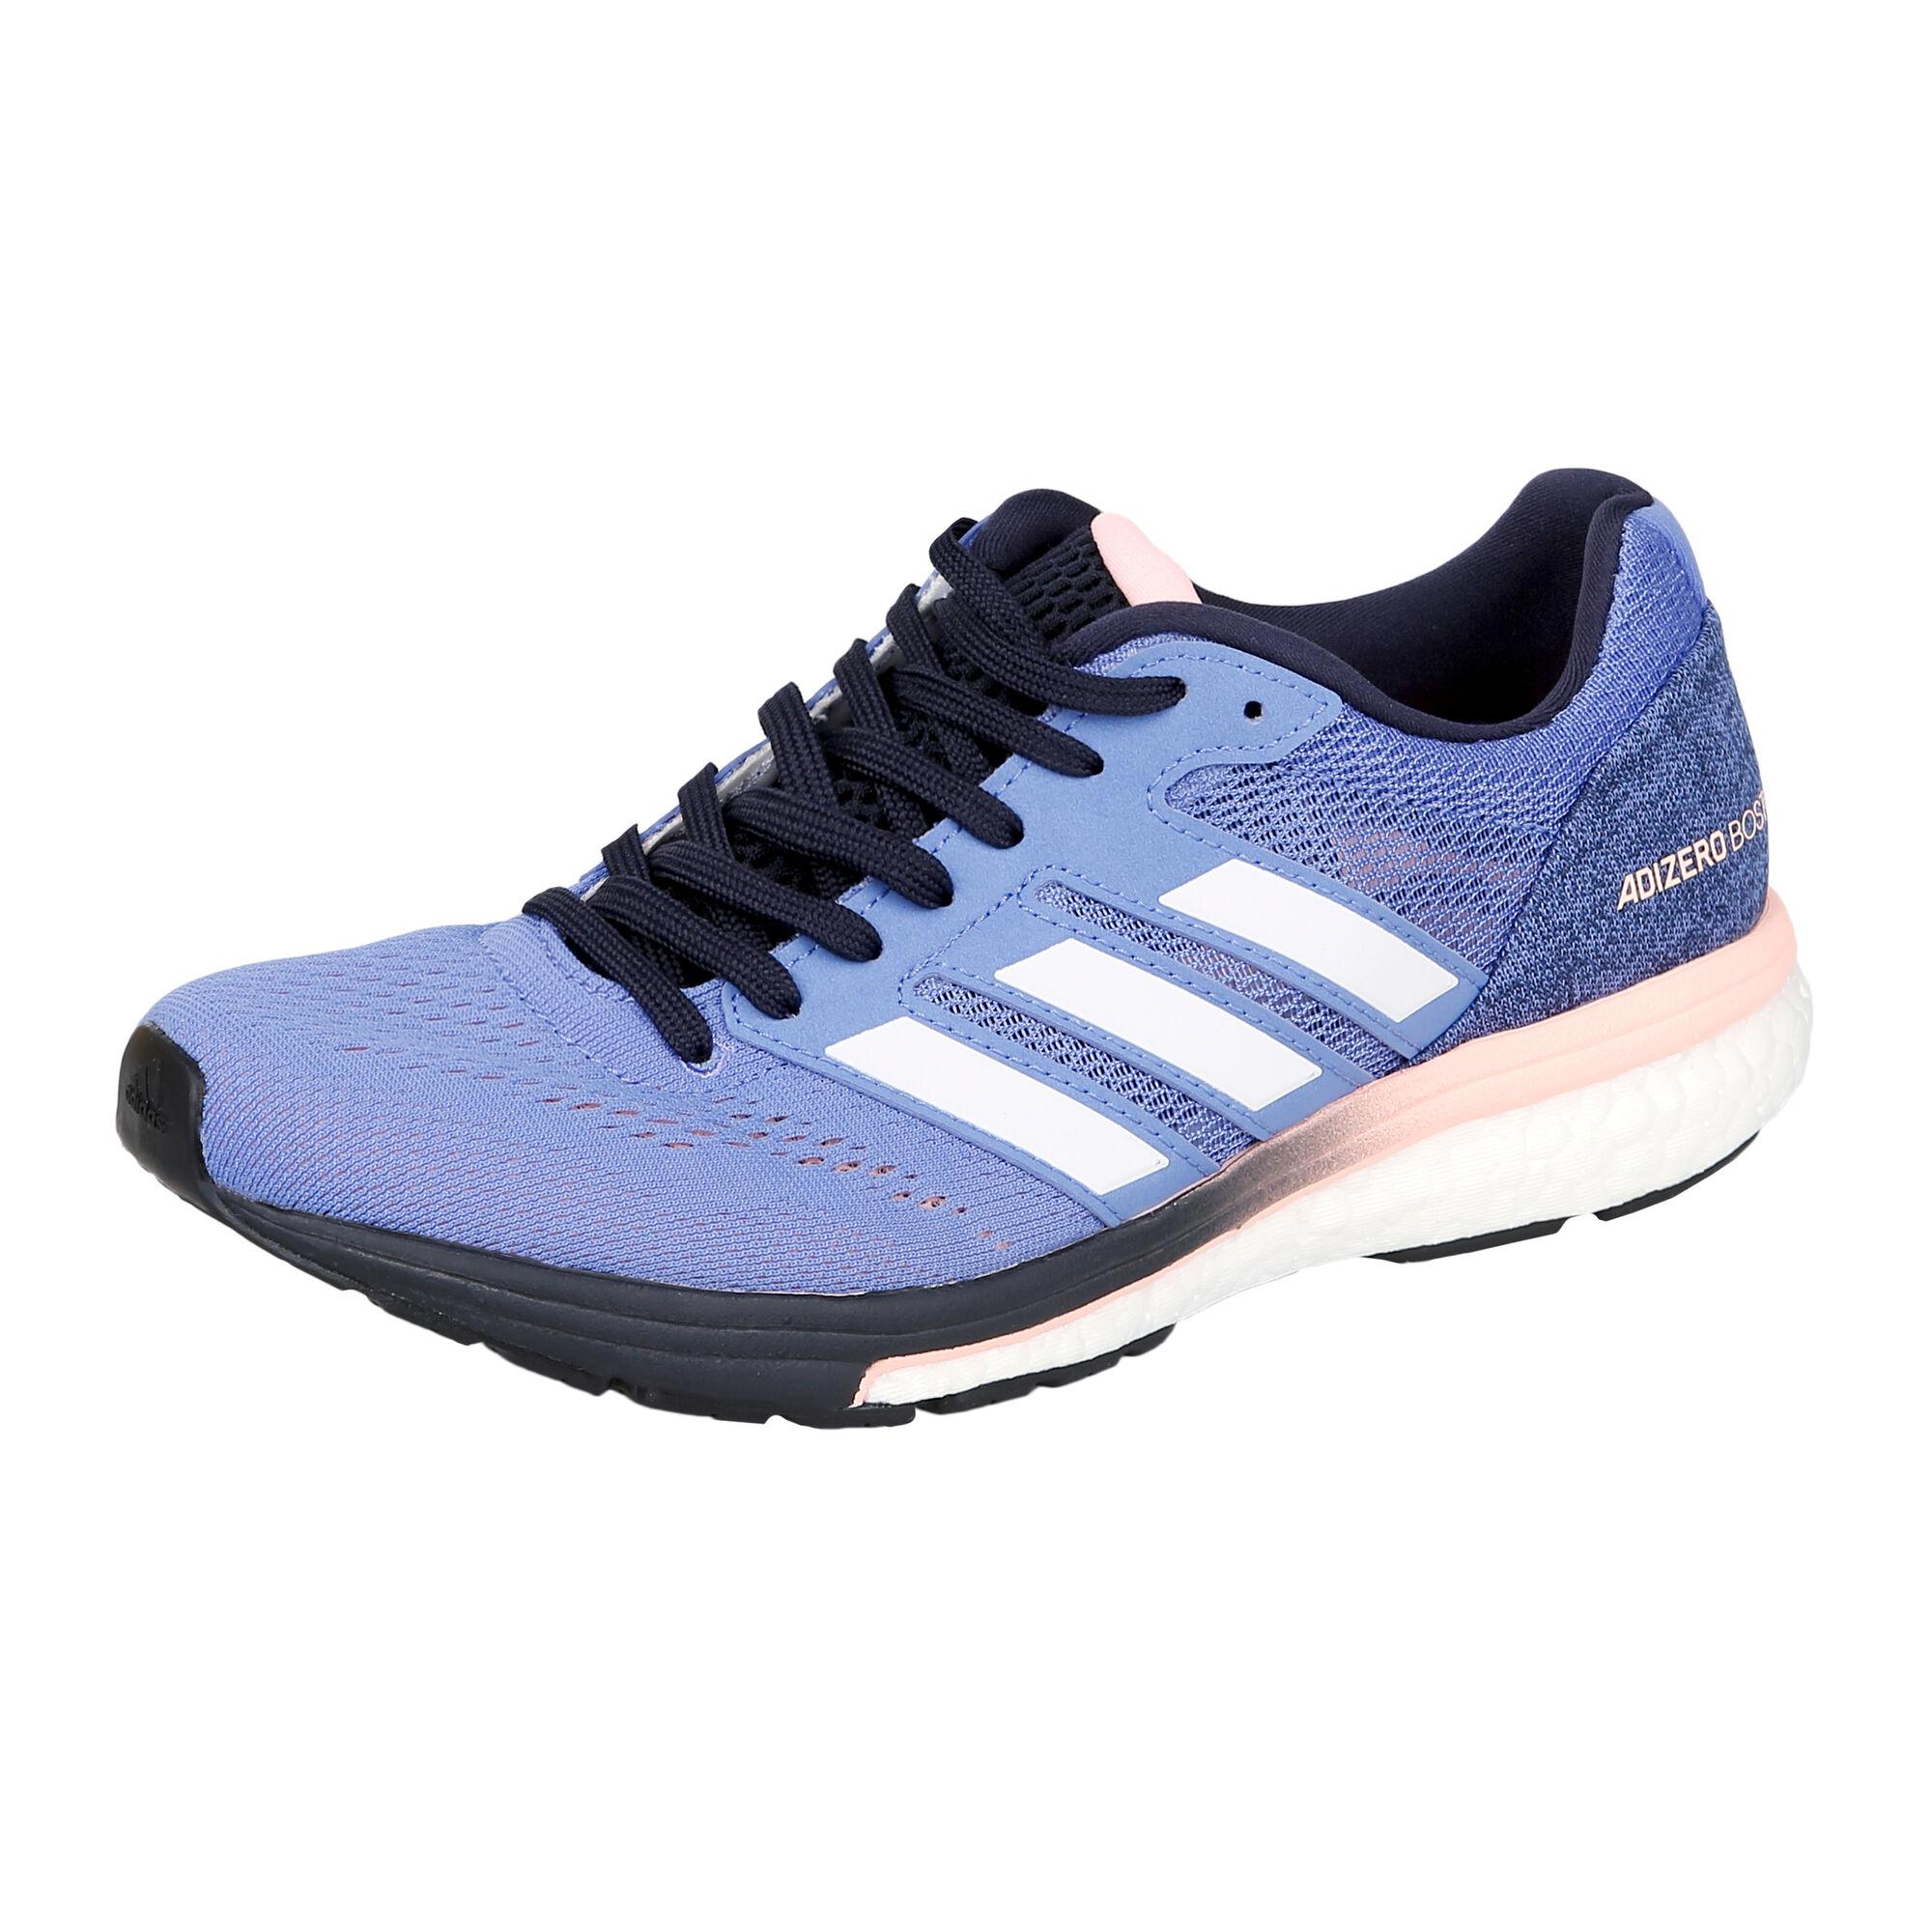 328c58beb09 adidas Adizero Boston 7 Competition Running Shoe Women - Blue, Apricot